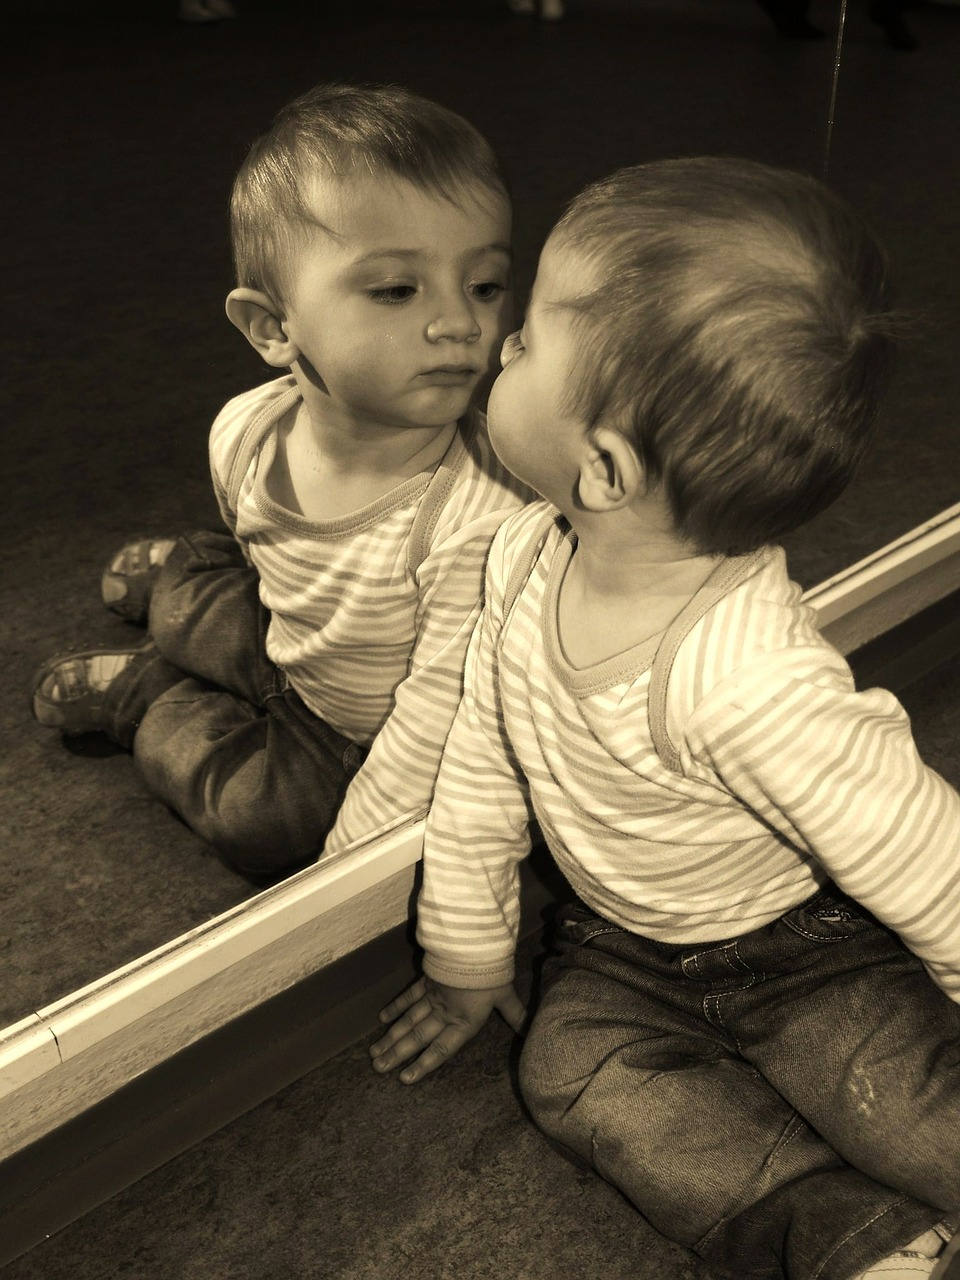 Child Boy Mirror - Free photo on Pixabay